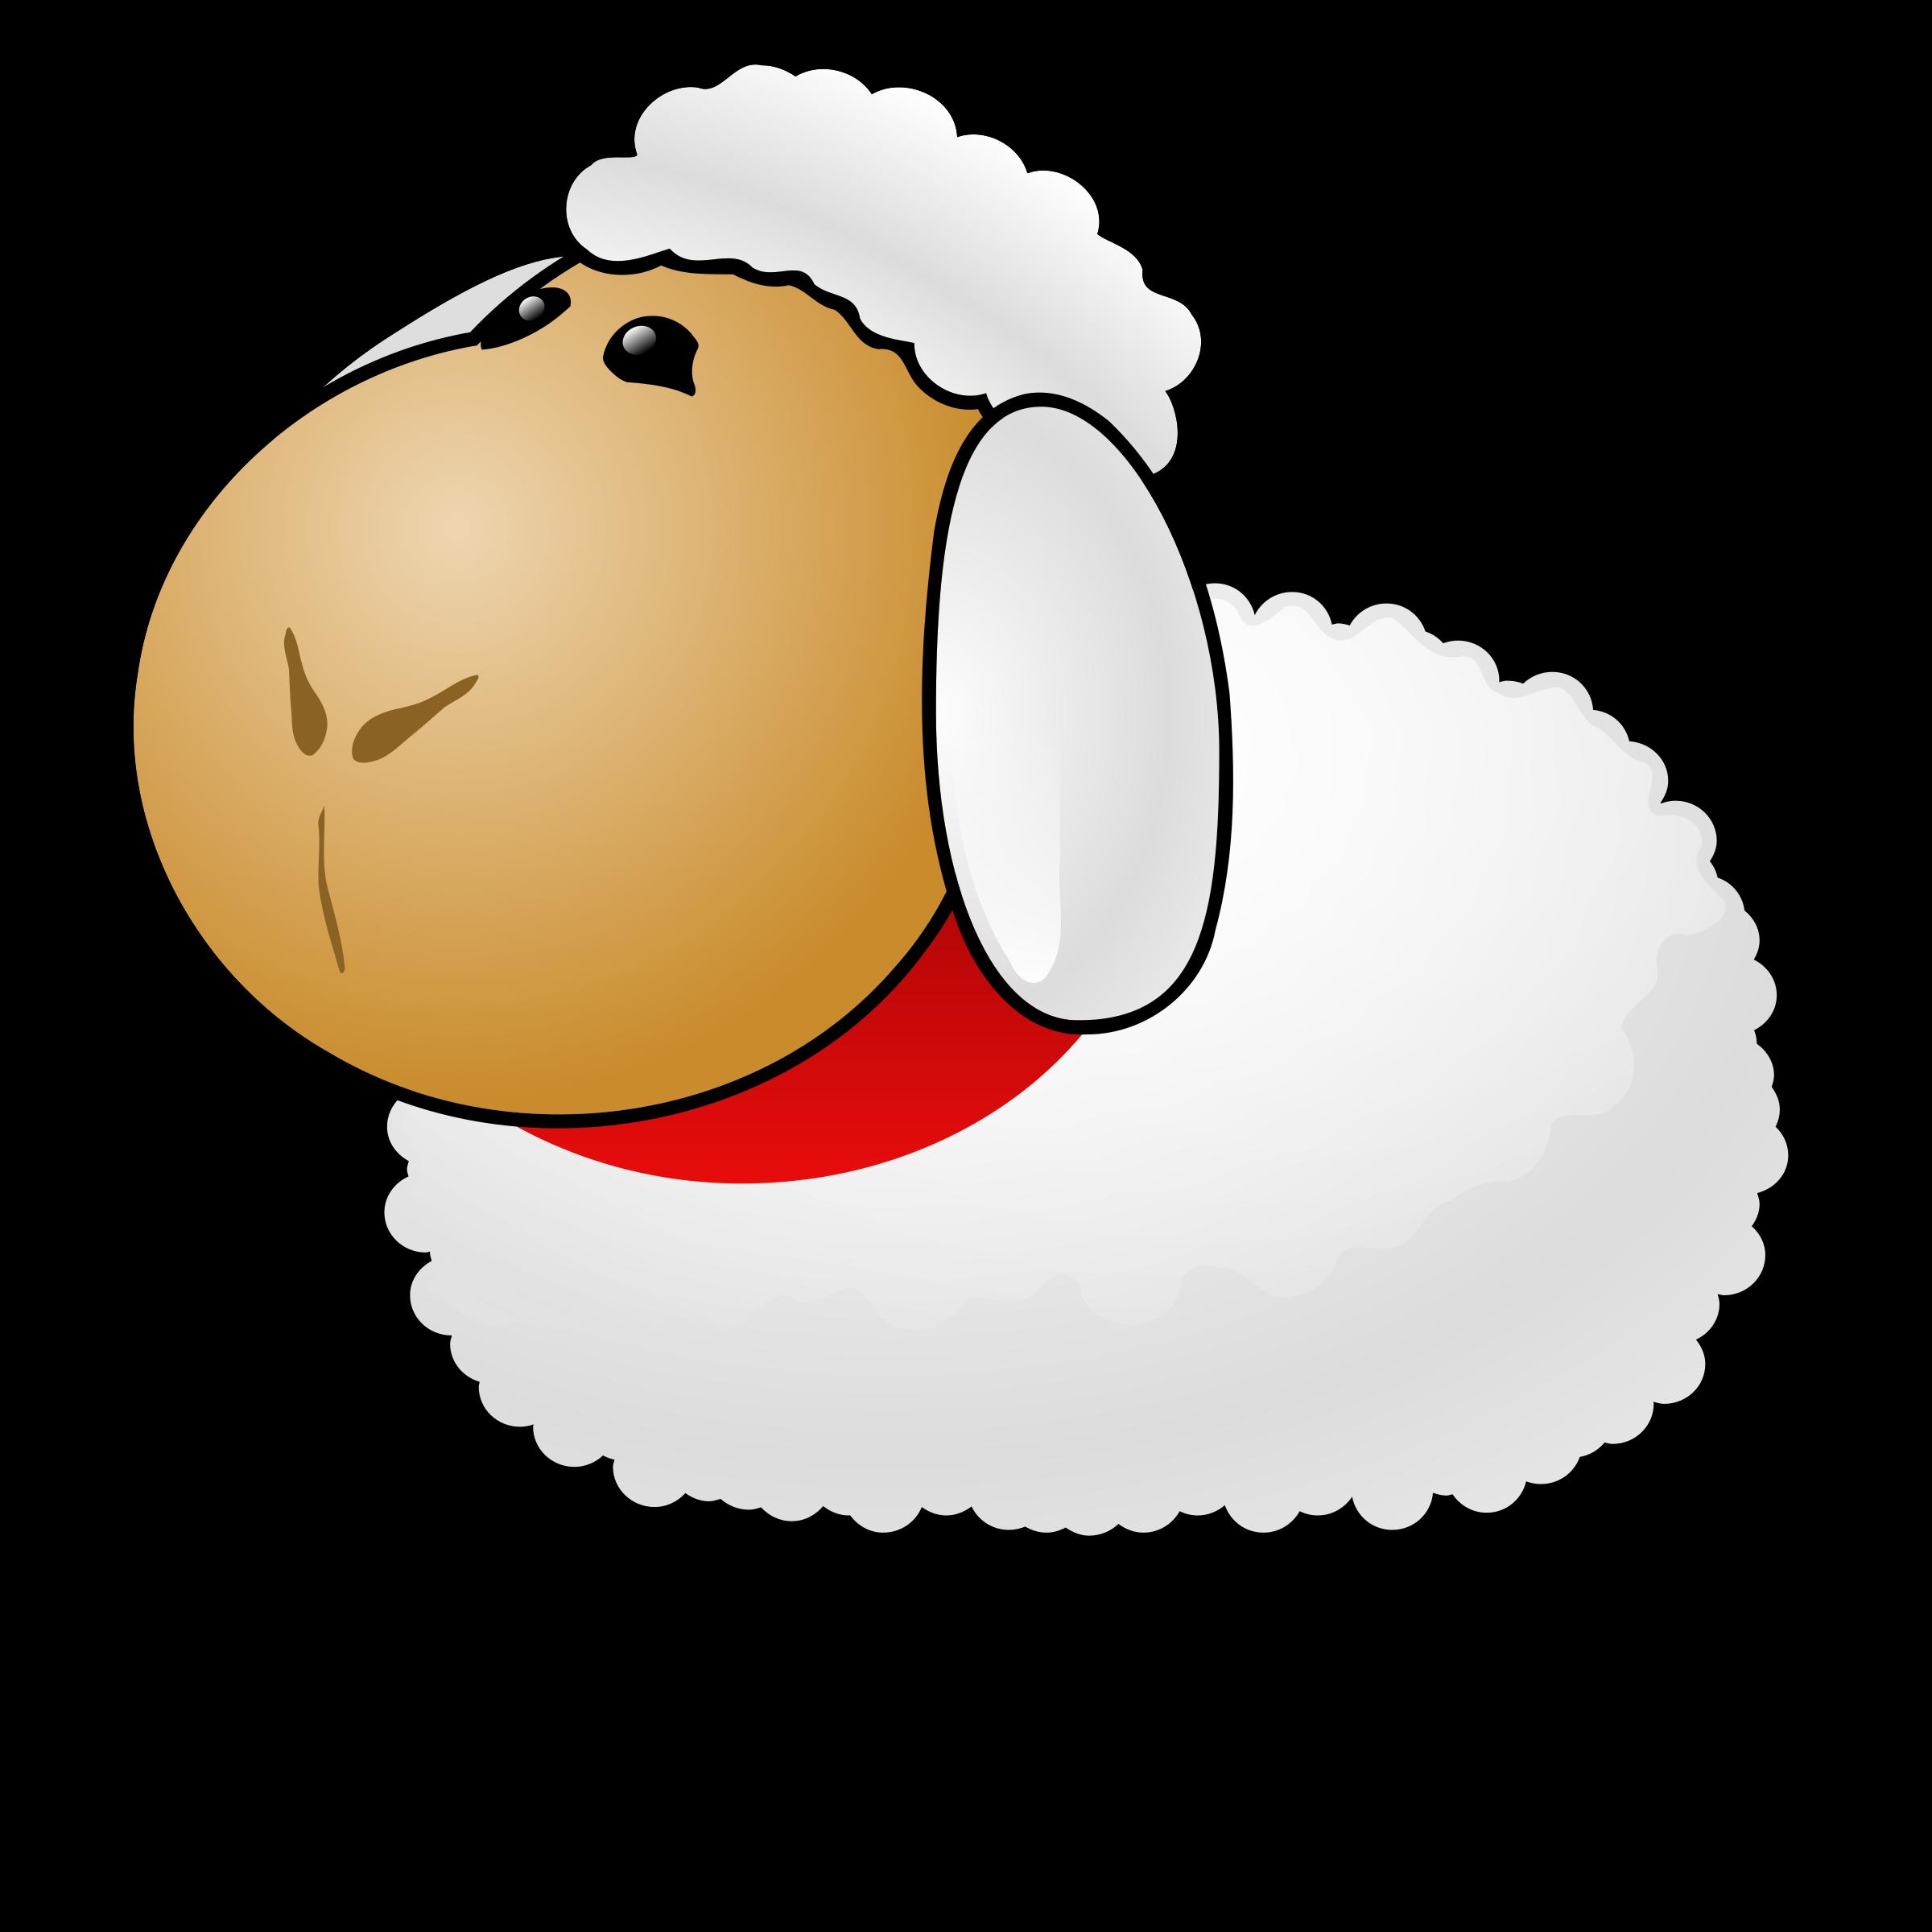 Sheep big image png. Lamb clipart scared